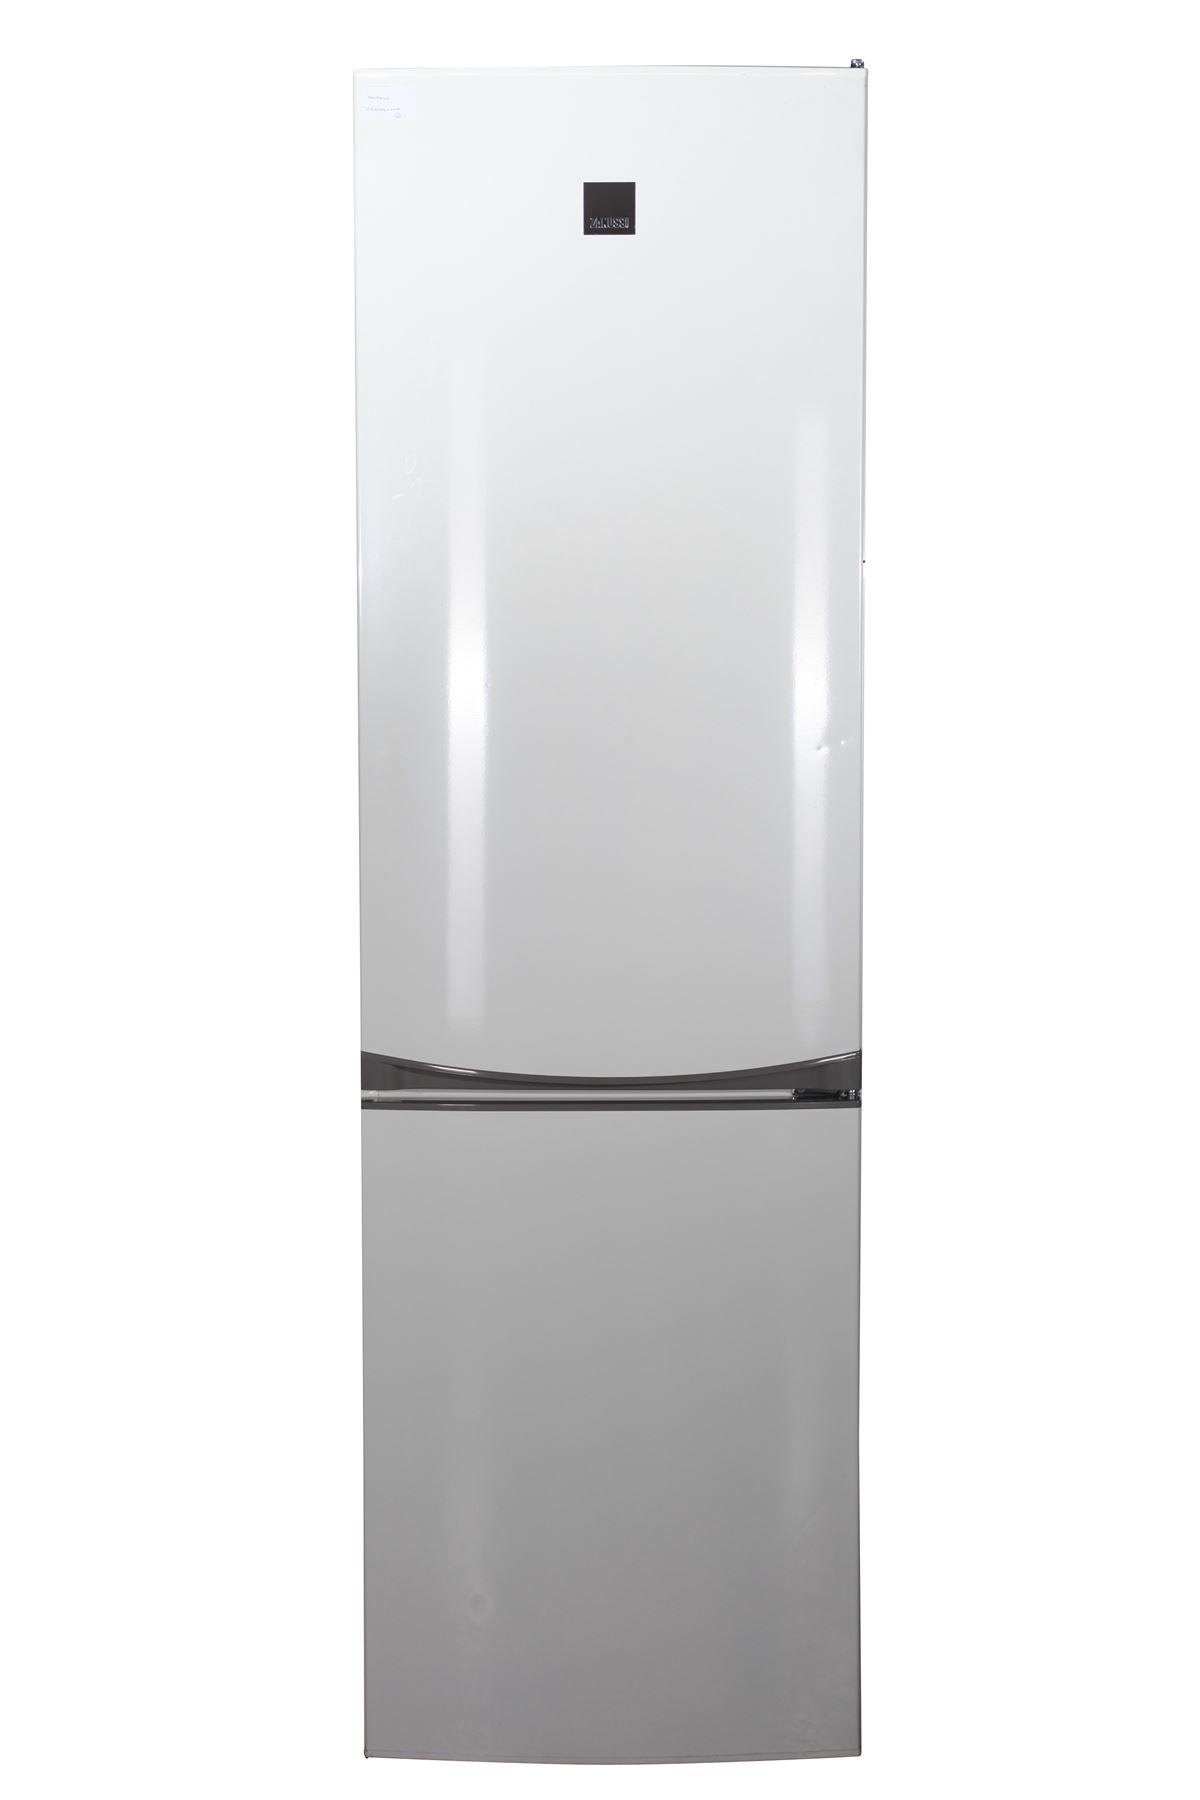 Preloved Zanussi Fridge Freezer Zrb38214wa White For